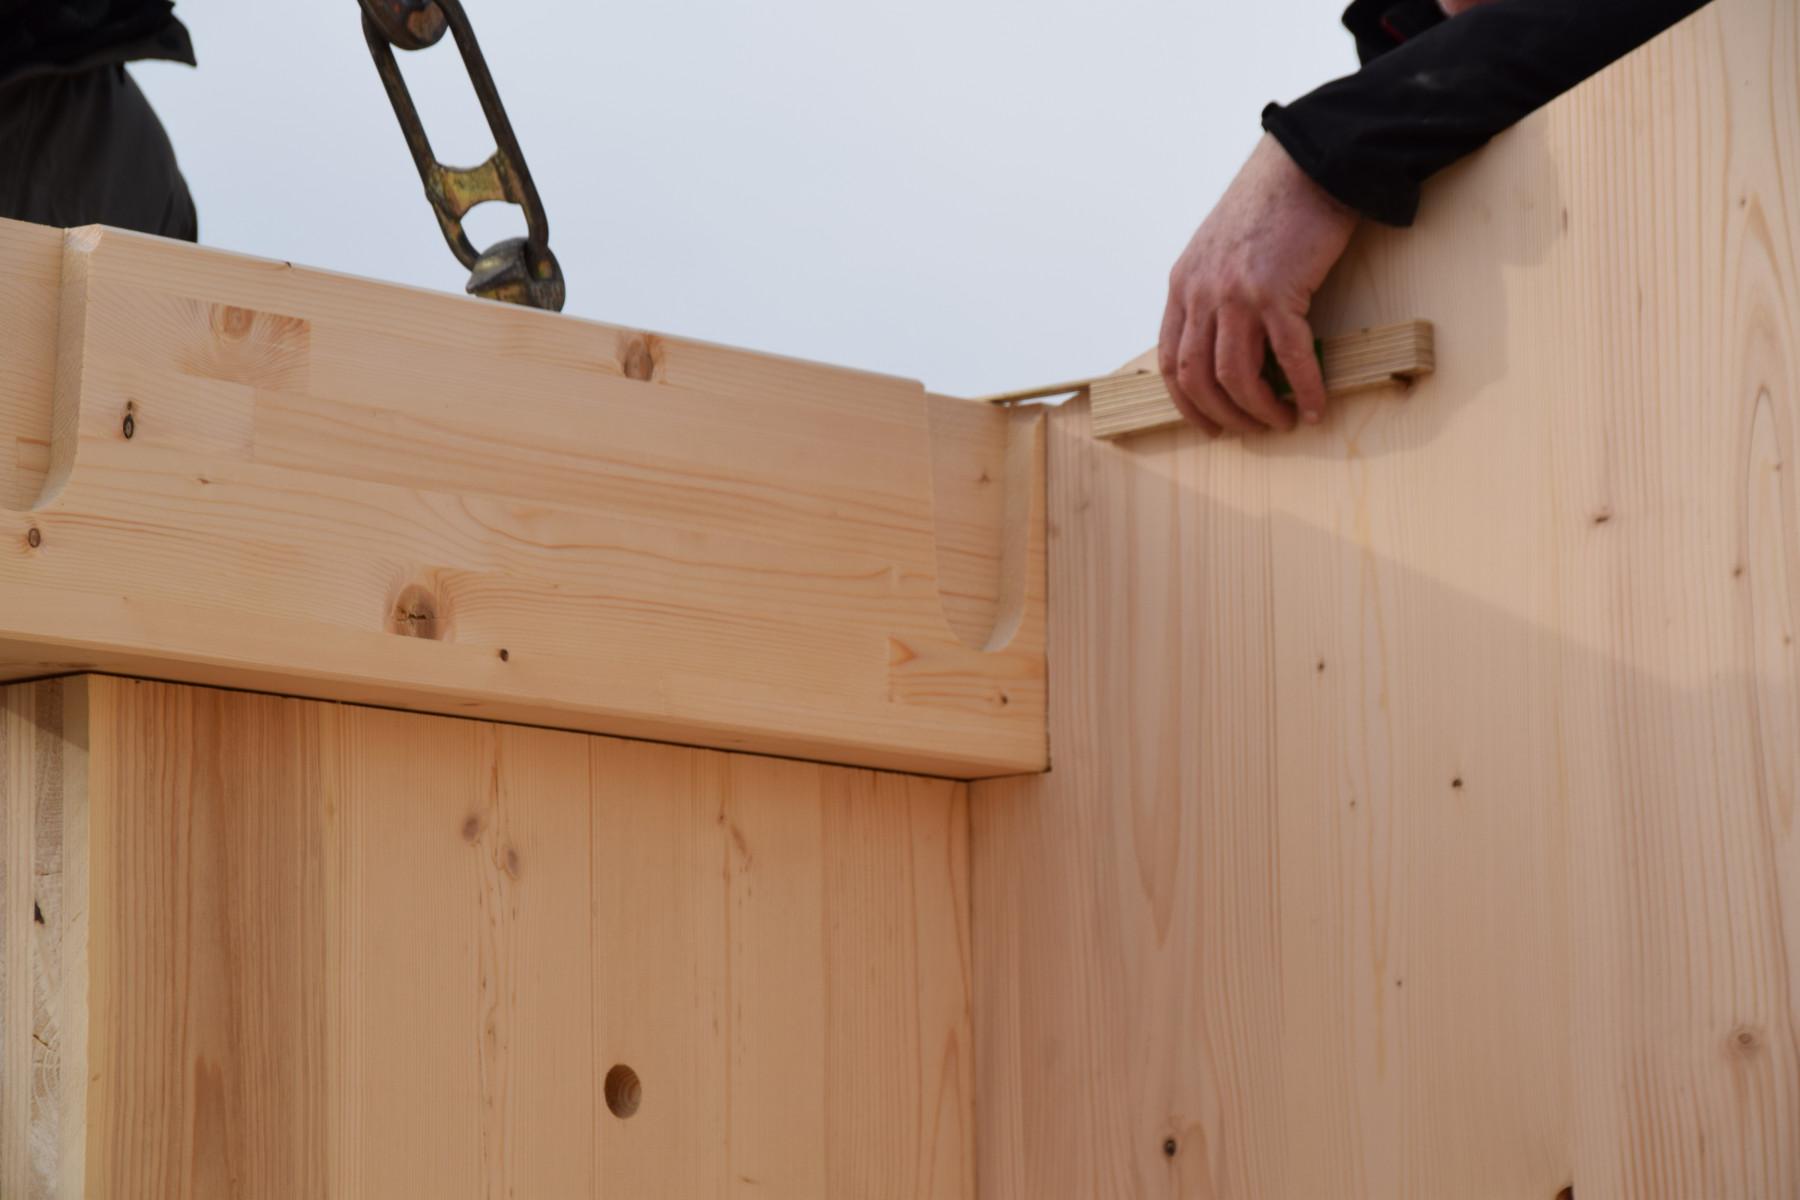 DSC_0727Strasser Holzbau Riedering.jpg